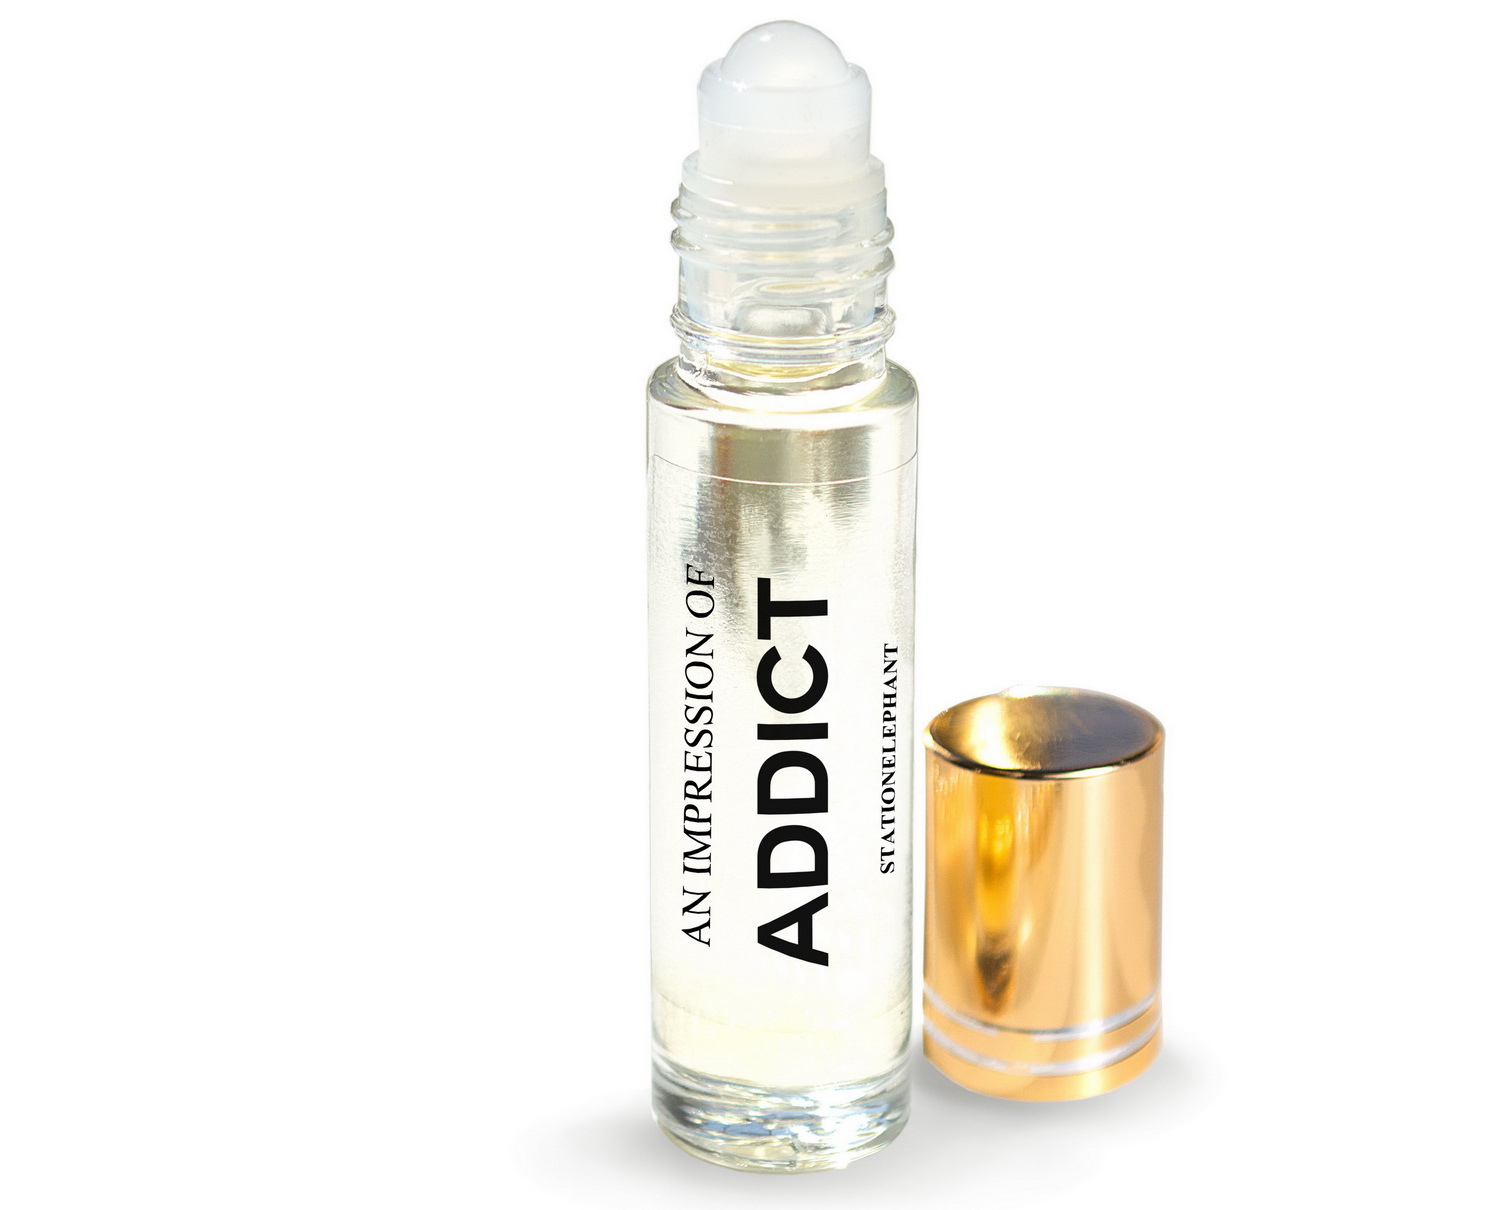 ADDICT Type Vegan Perfume Oil by StationElephant.